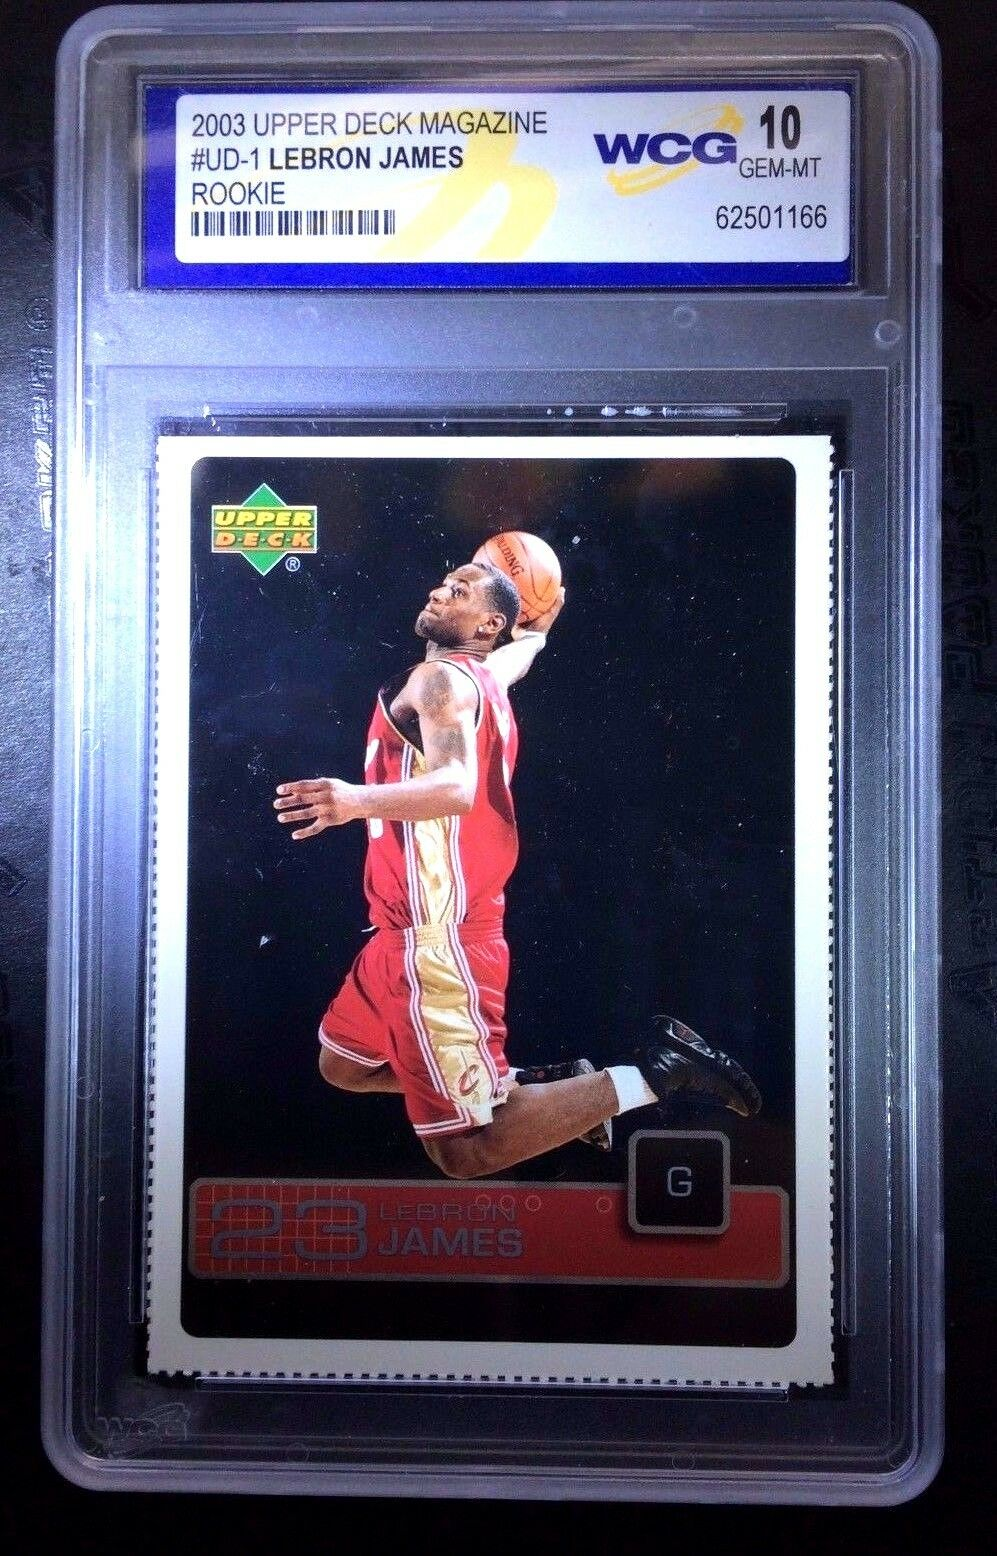 Lebron James Rc 2003 Upper Deck Magazine Rookie Card Ud1 Wcg10 Cavaliers G Goat Ebay